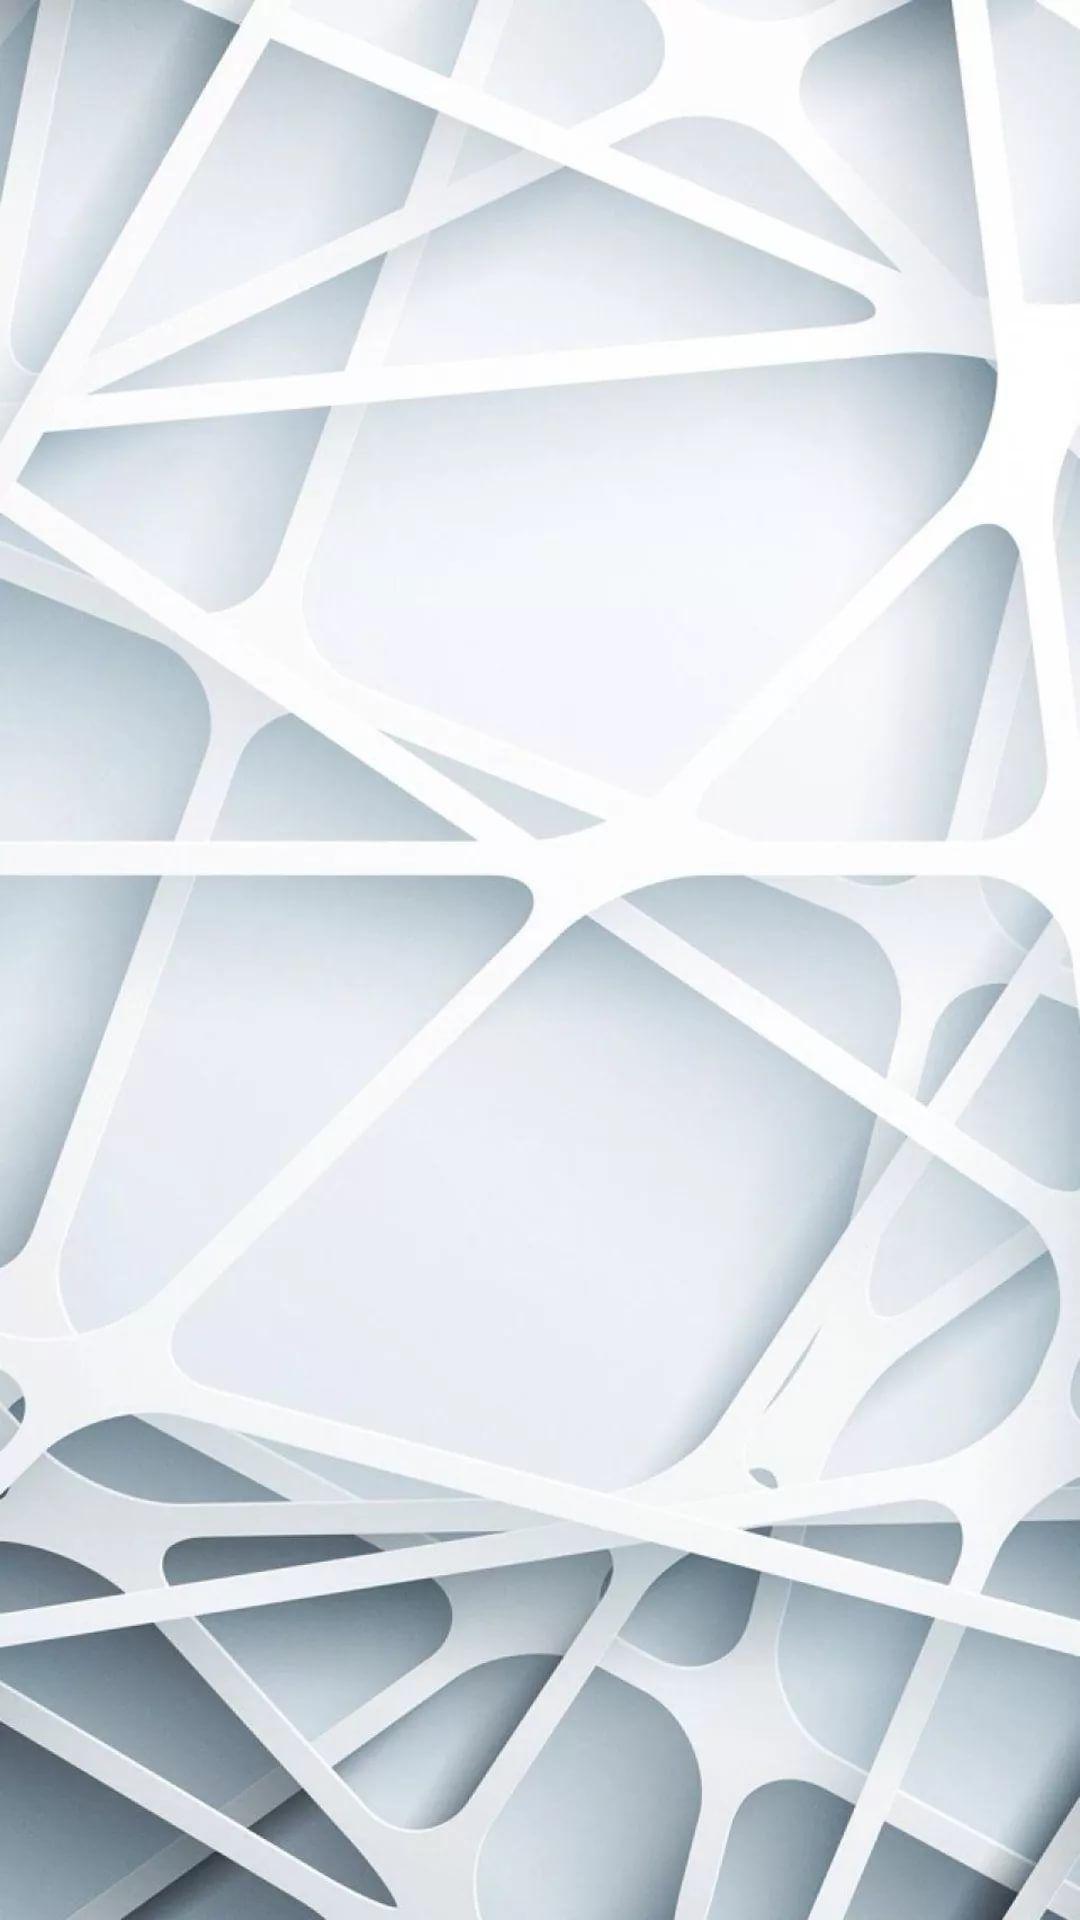 White HD wallpaper for mobile